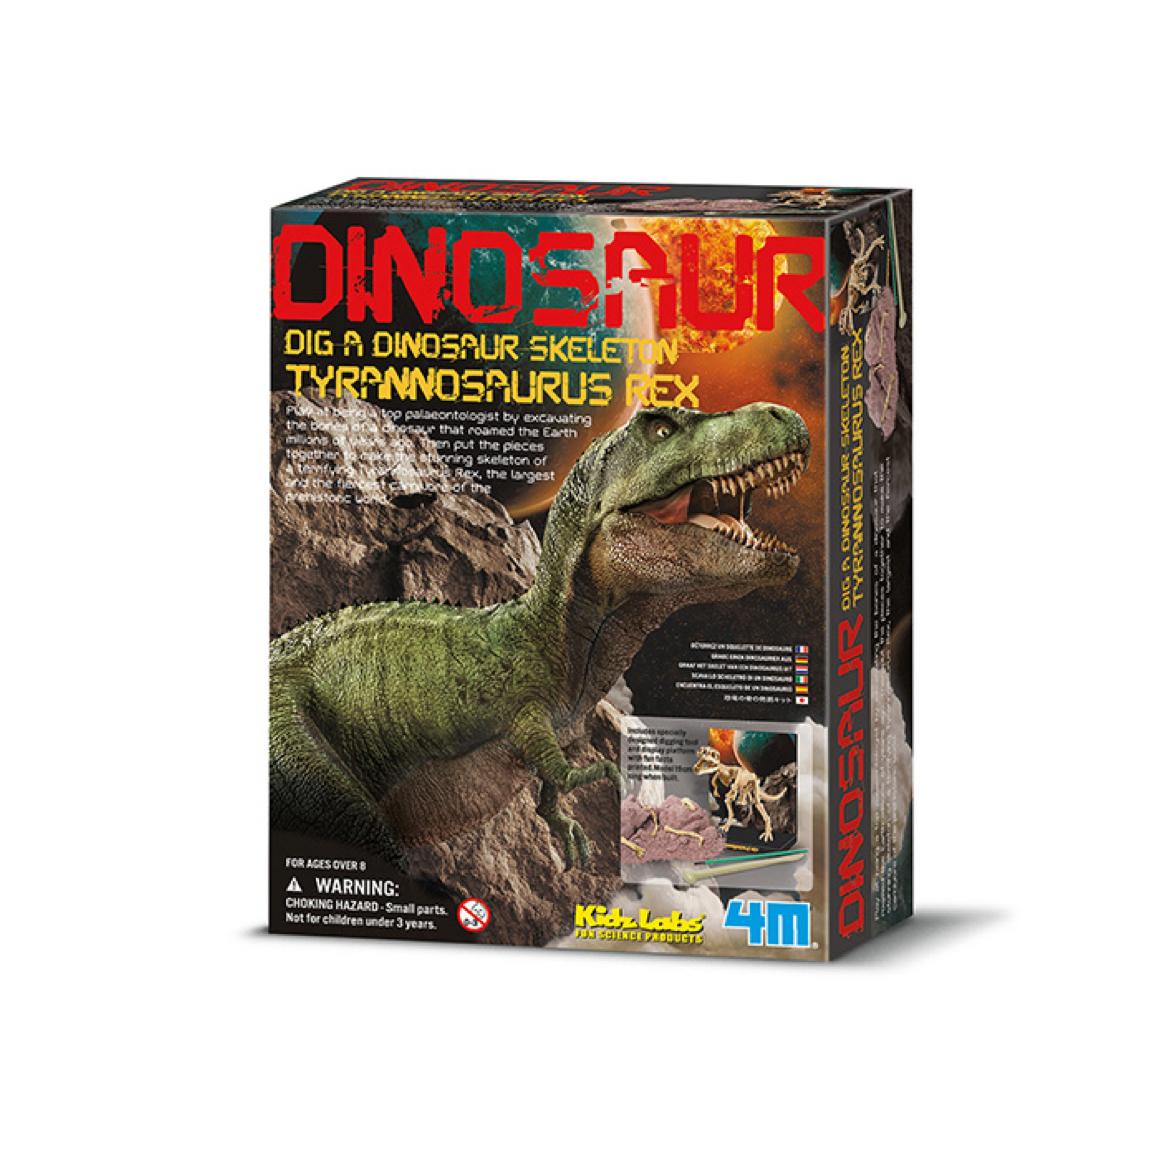 esqueleto-de-tiranosaurio-rex-tyrannosaurus-rex-skeleton-de-4m-en-el-mundo-de-mico